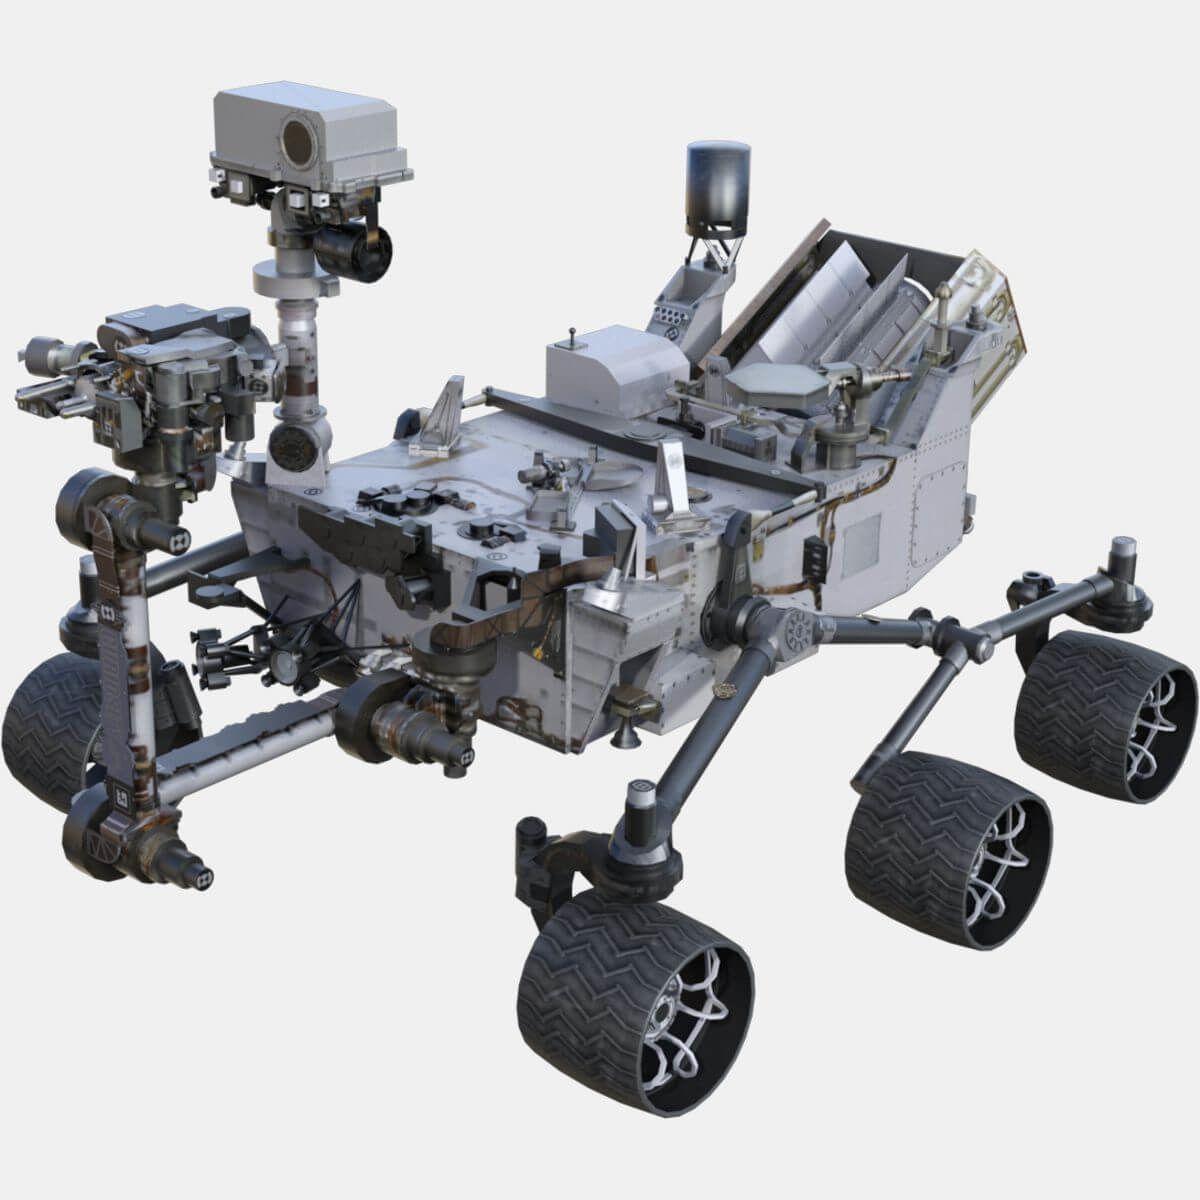 Nasa Curiosity Rover 3d Model Nasa Curiosity Rover Curiosity Rover 3d Model